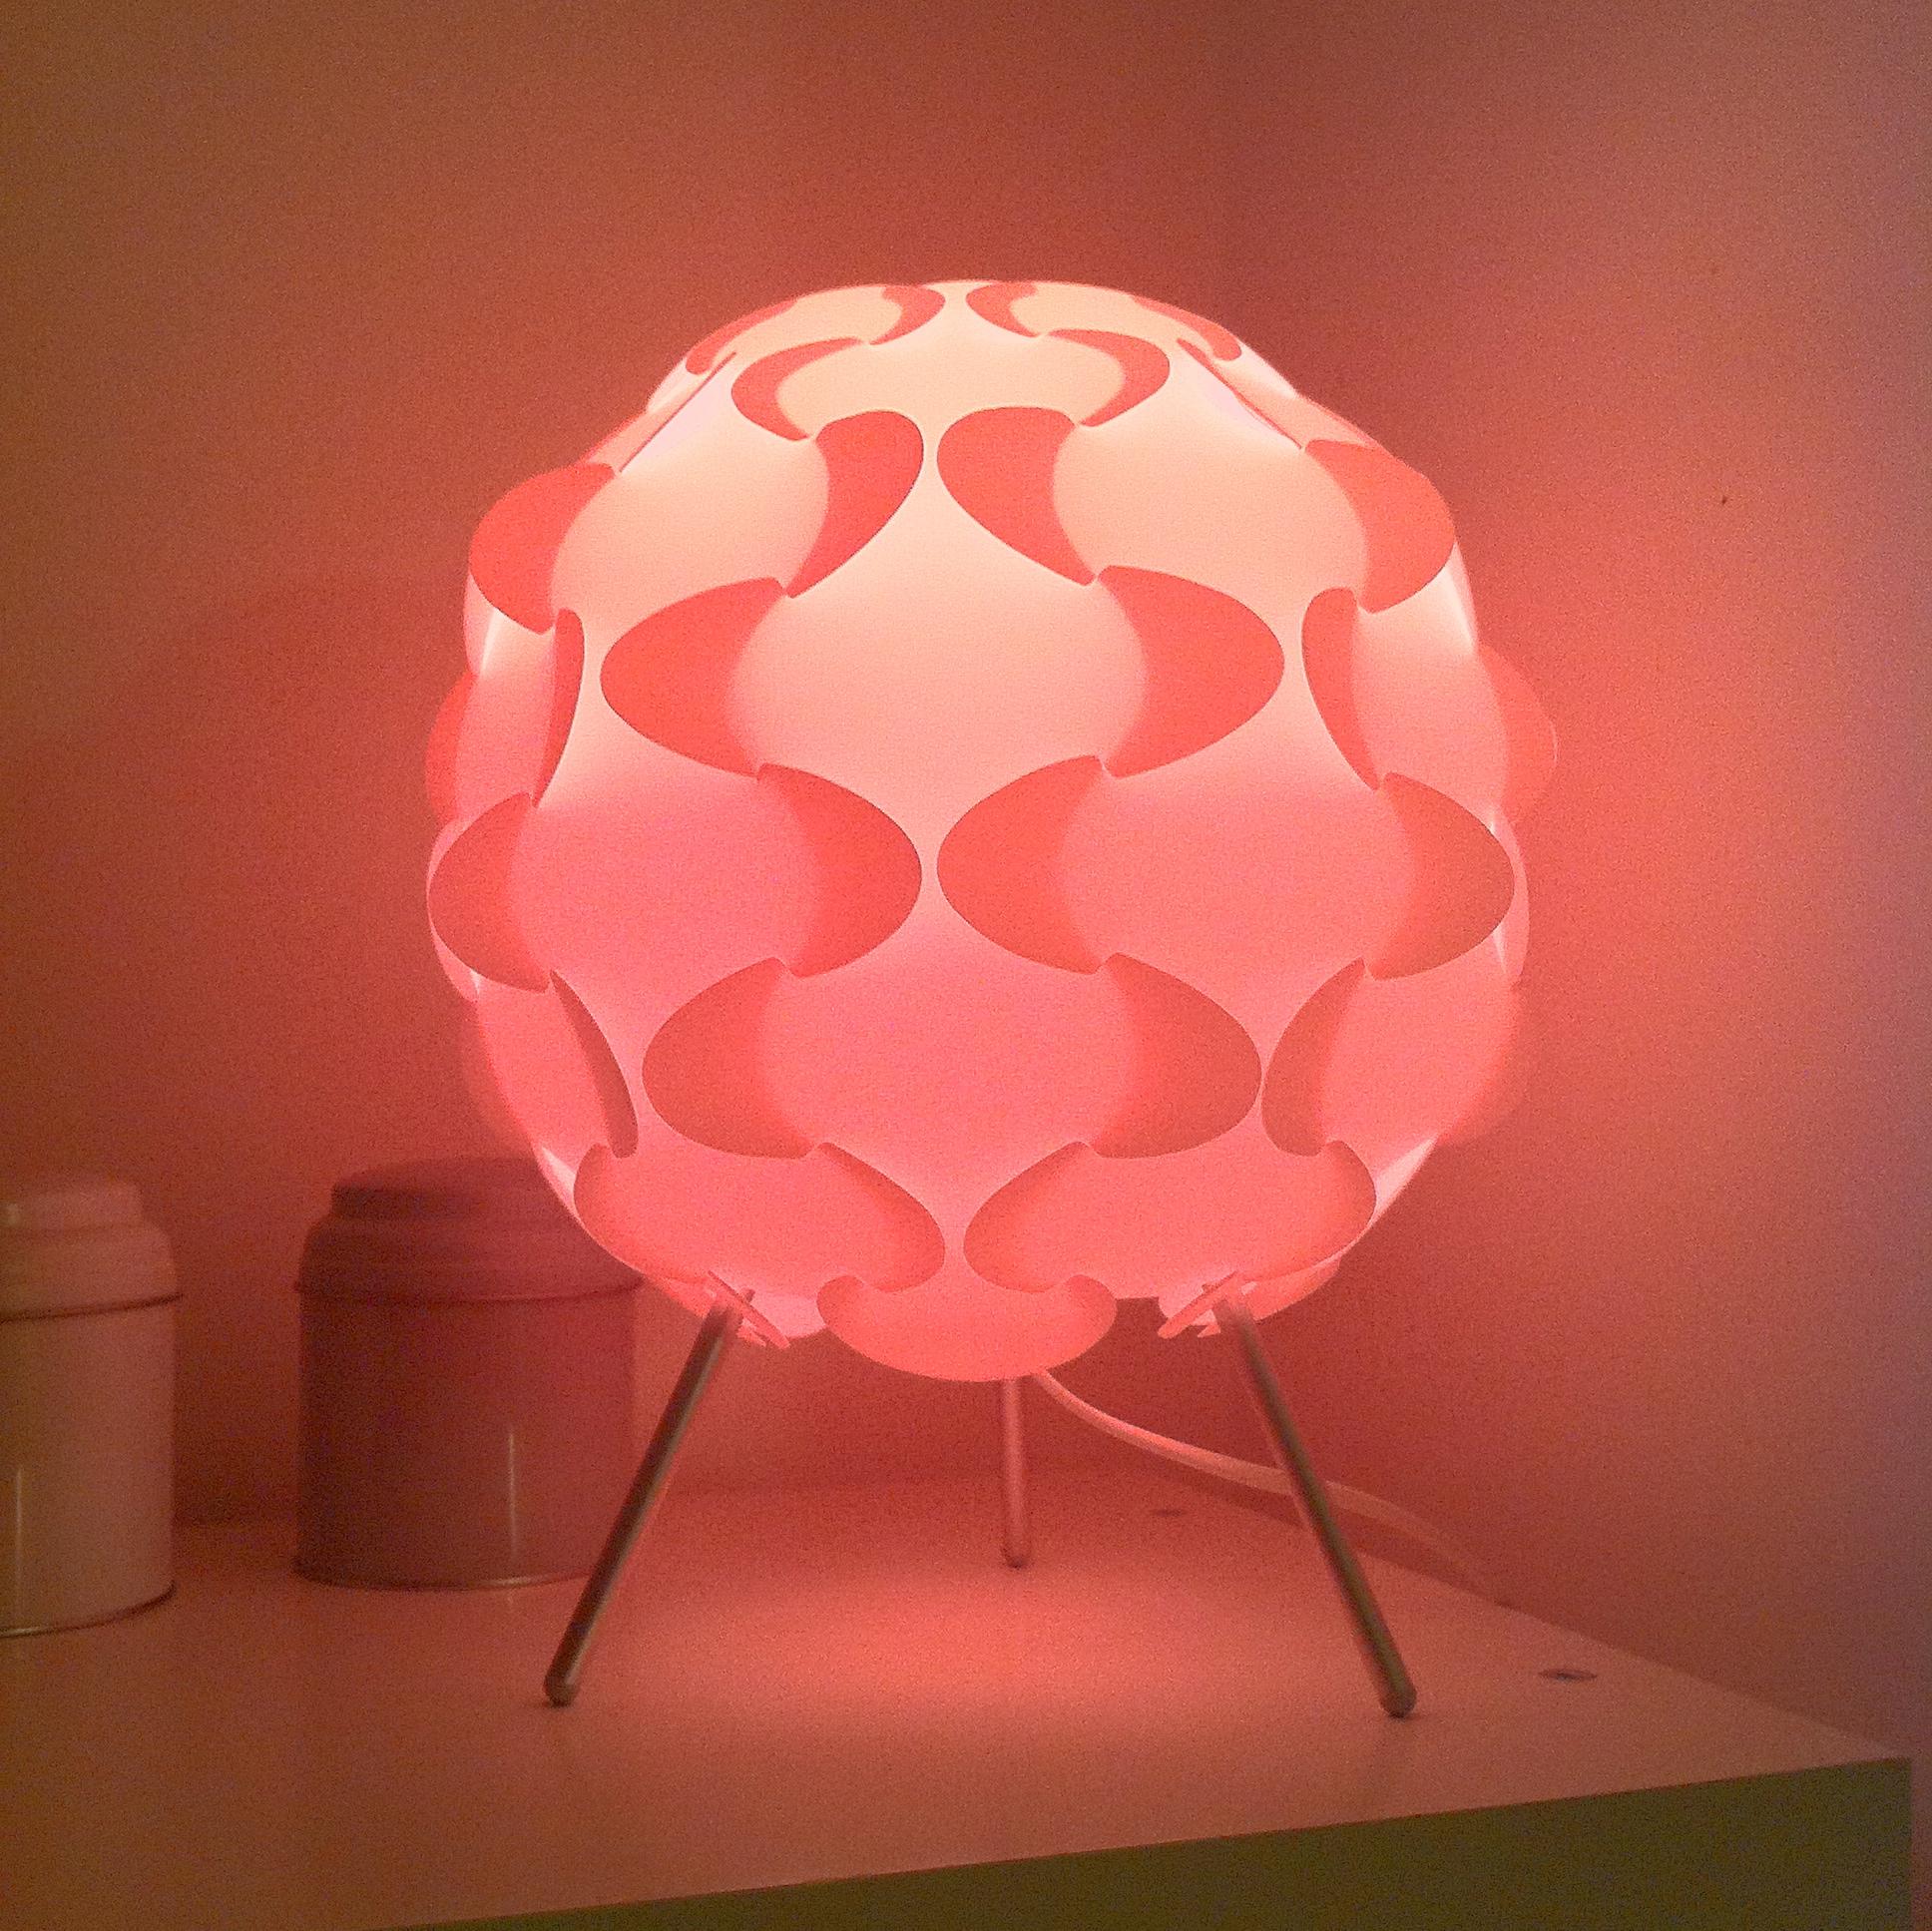 lampe qui change couleur. Black Bedroom Furniture Sets. Home Design Ideas